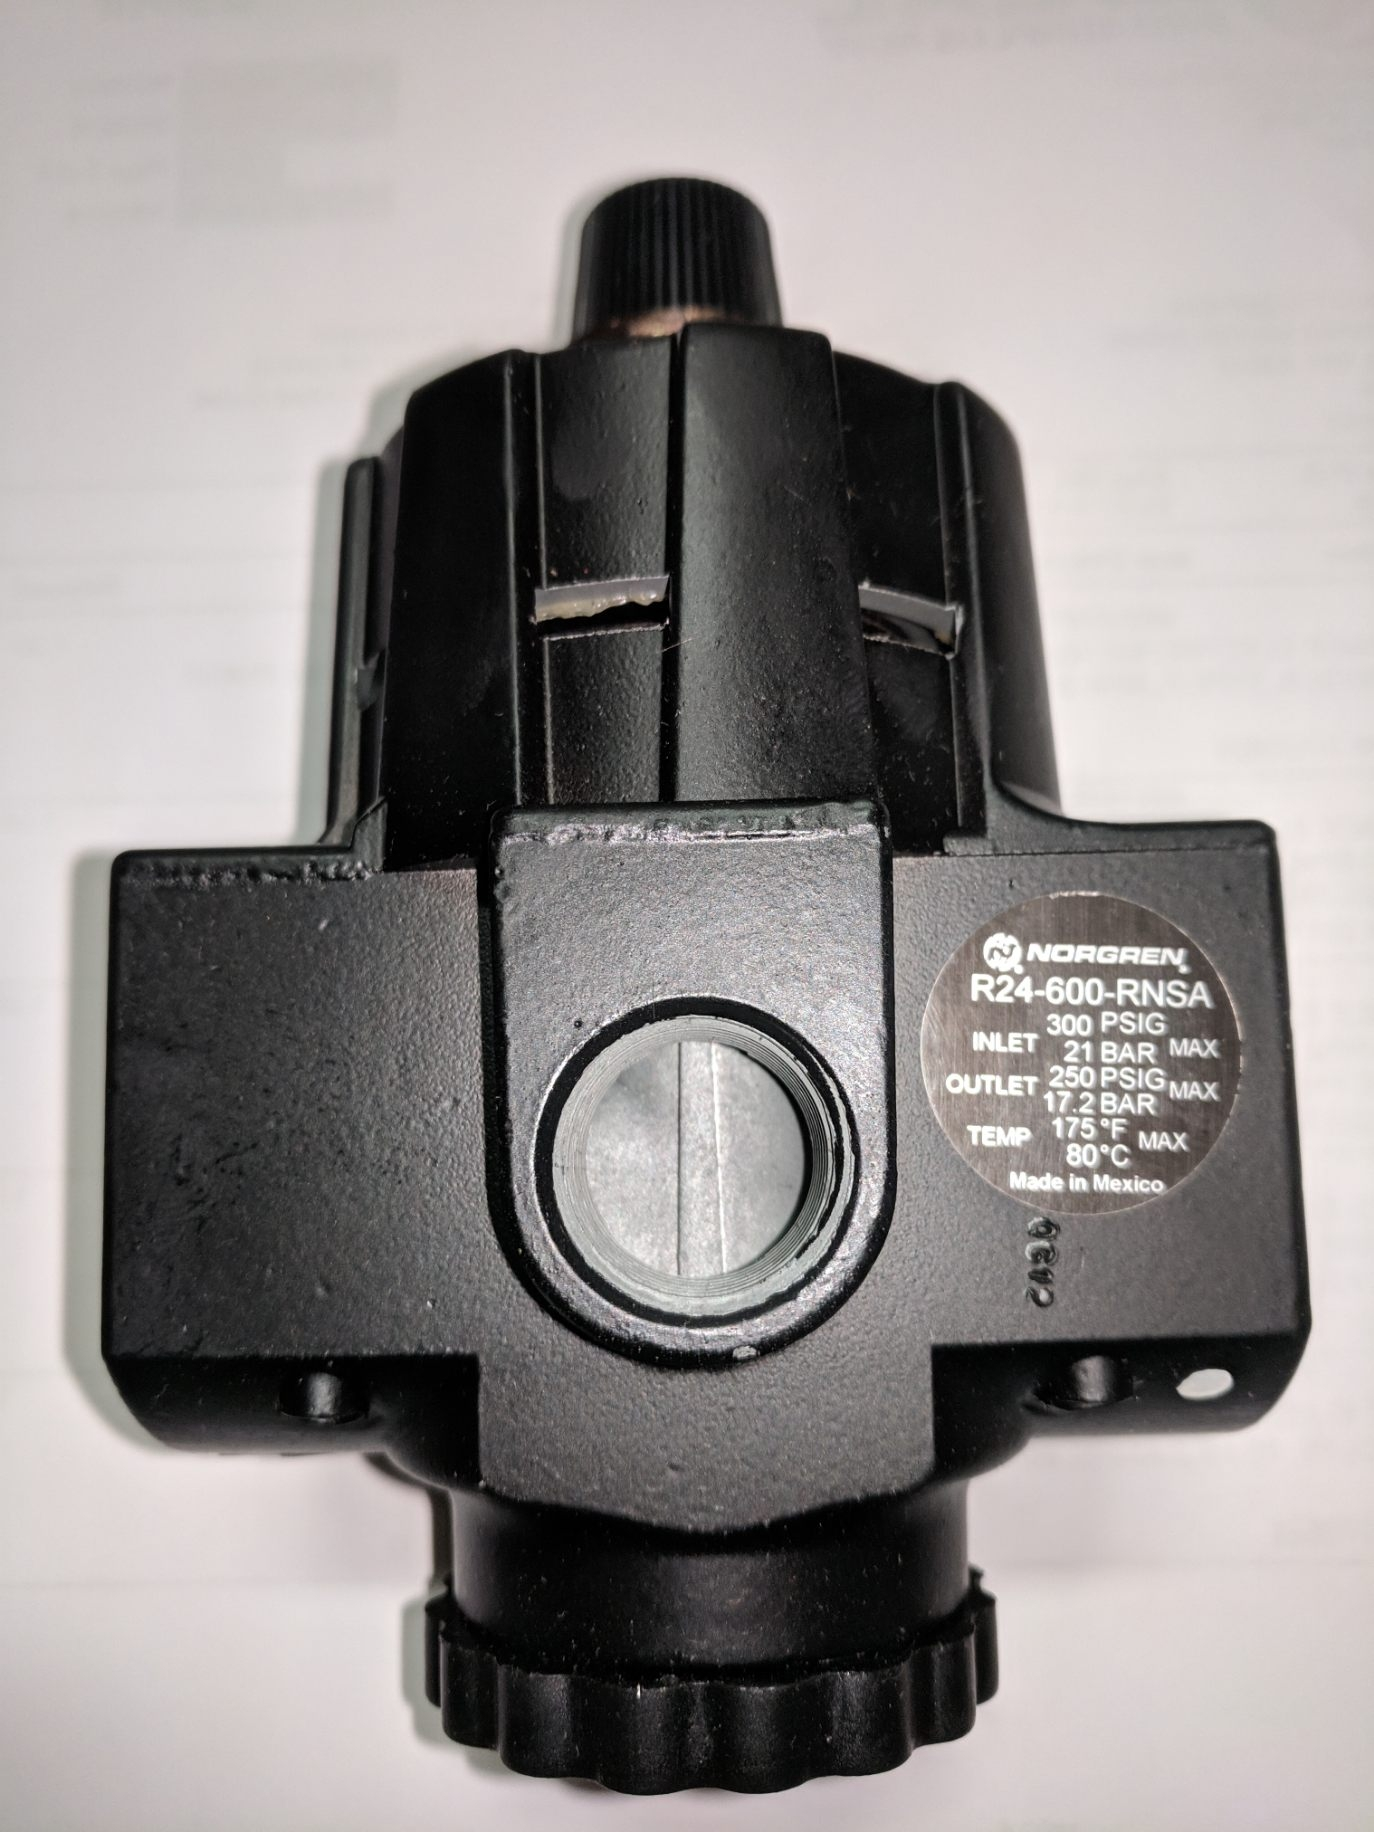 Norgren high pressure regulator ik multimedia irig nano amp